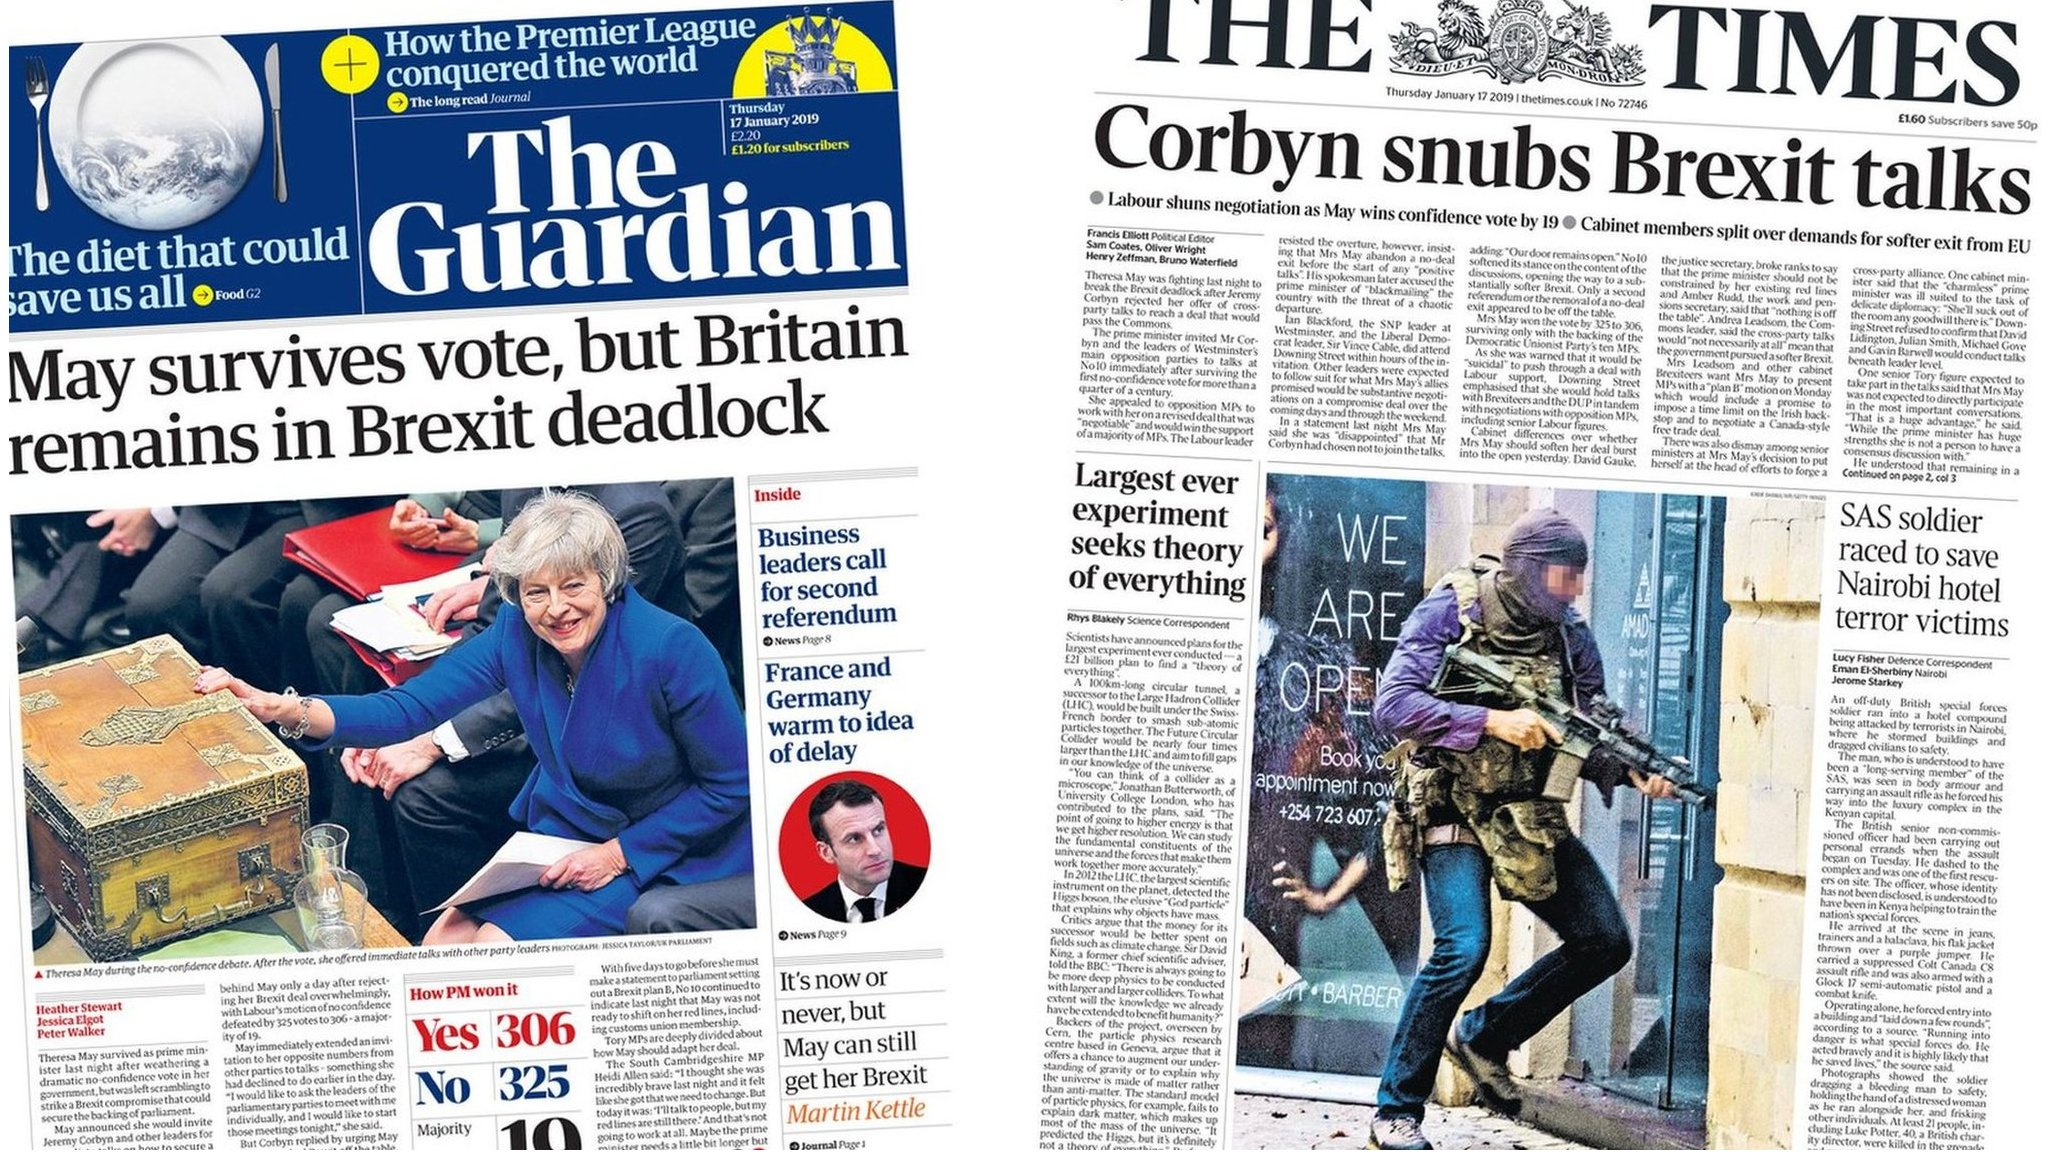 The Papers: Corbyn's 'snub' amid Brexit deadlock